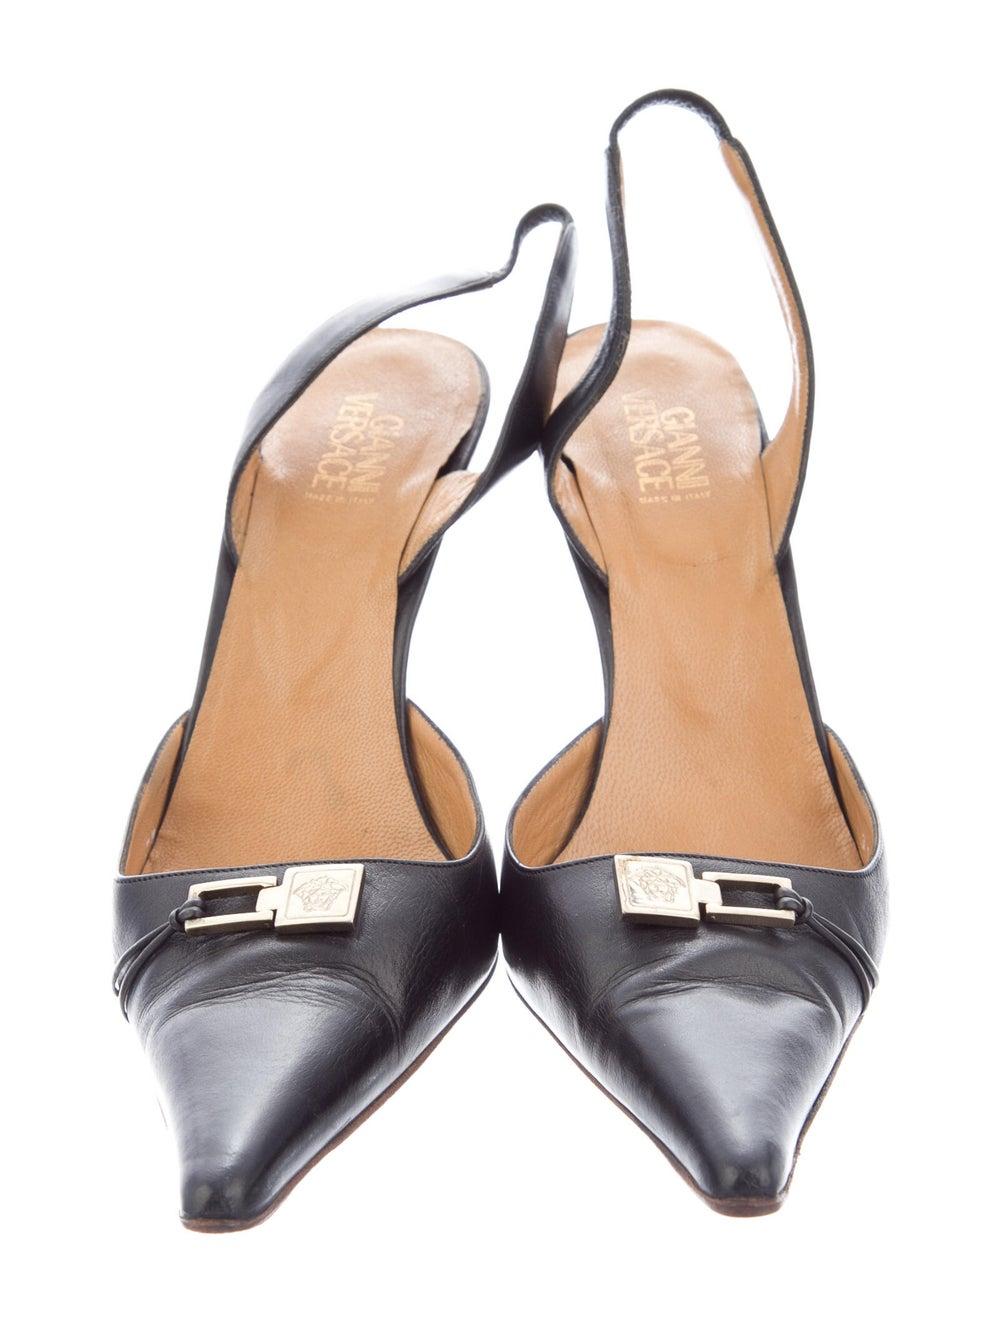 Gianni Versace Leather Slingback Pumps Black - image 3